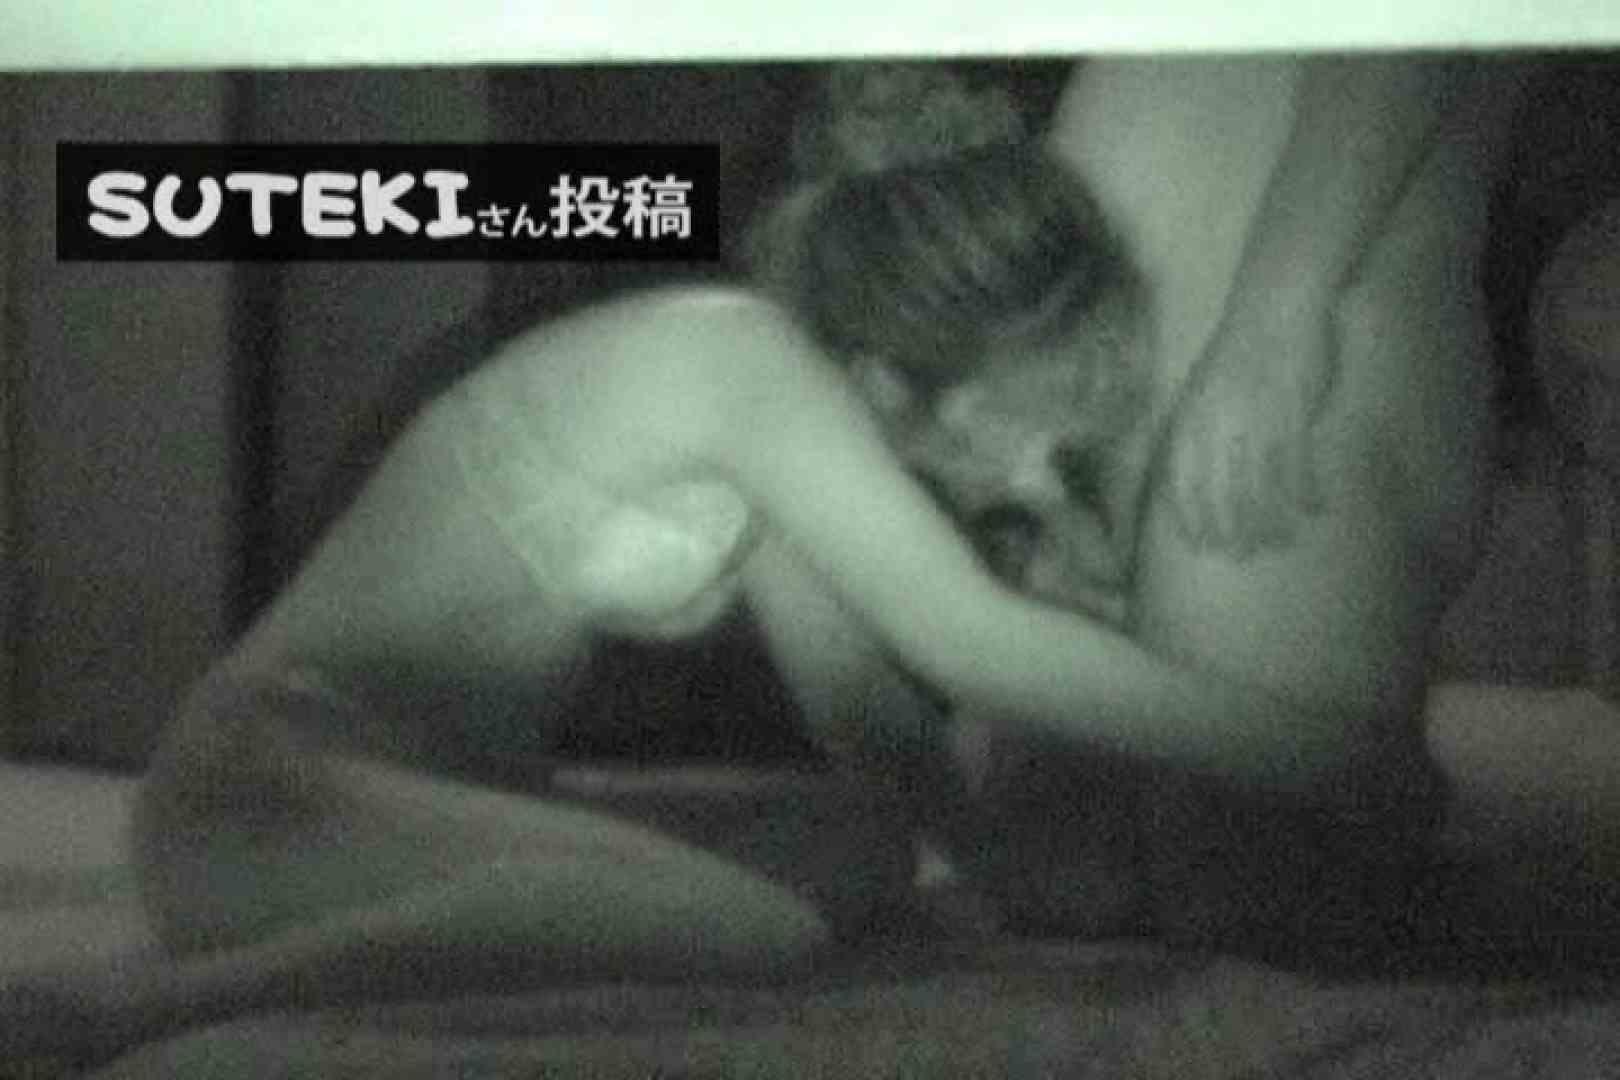 SUTEKIさん投稿 ナイトショット 盗撮 | 一般投稿  105画像 14